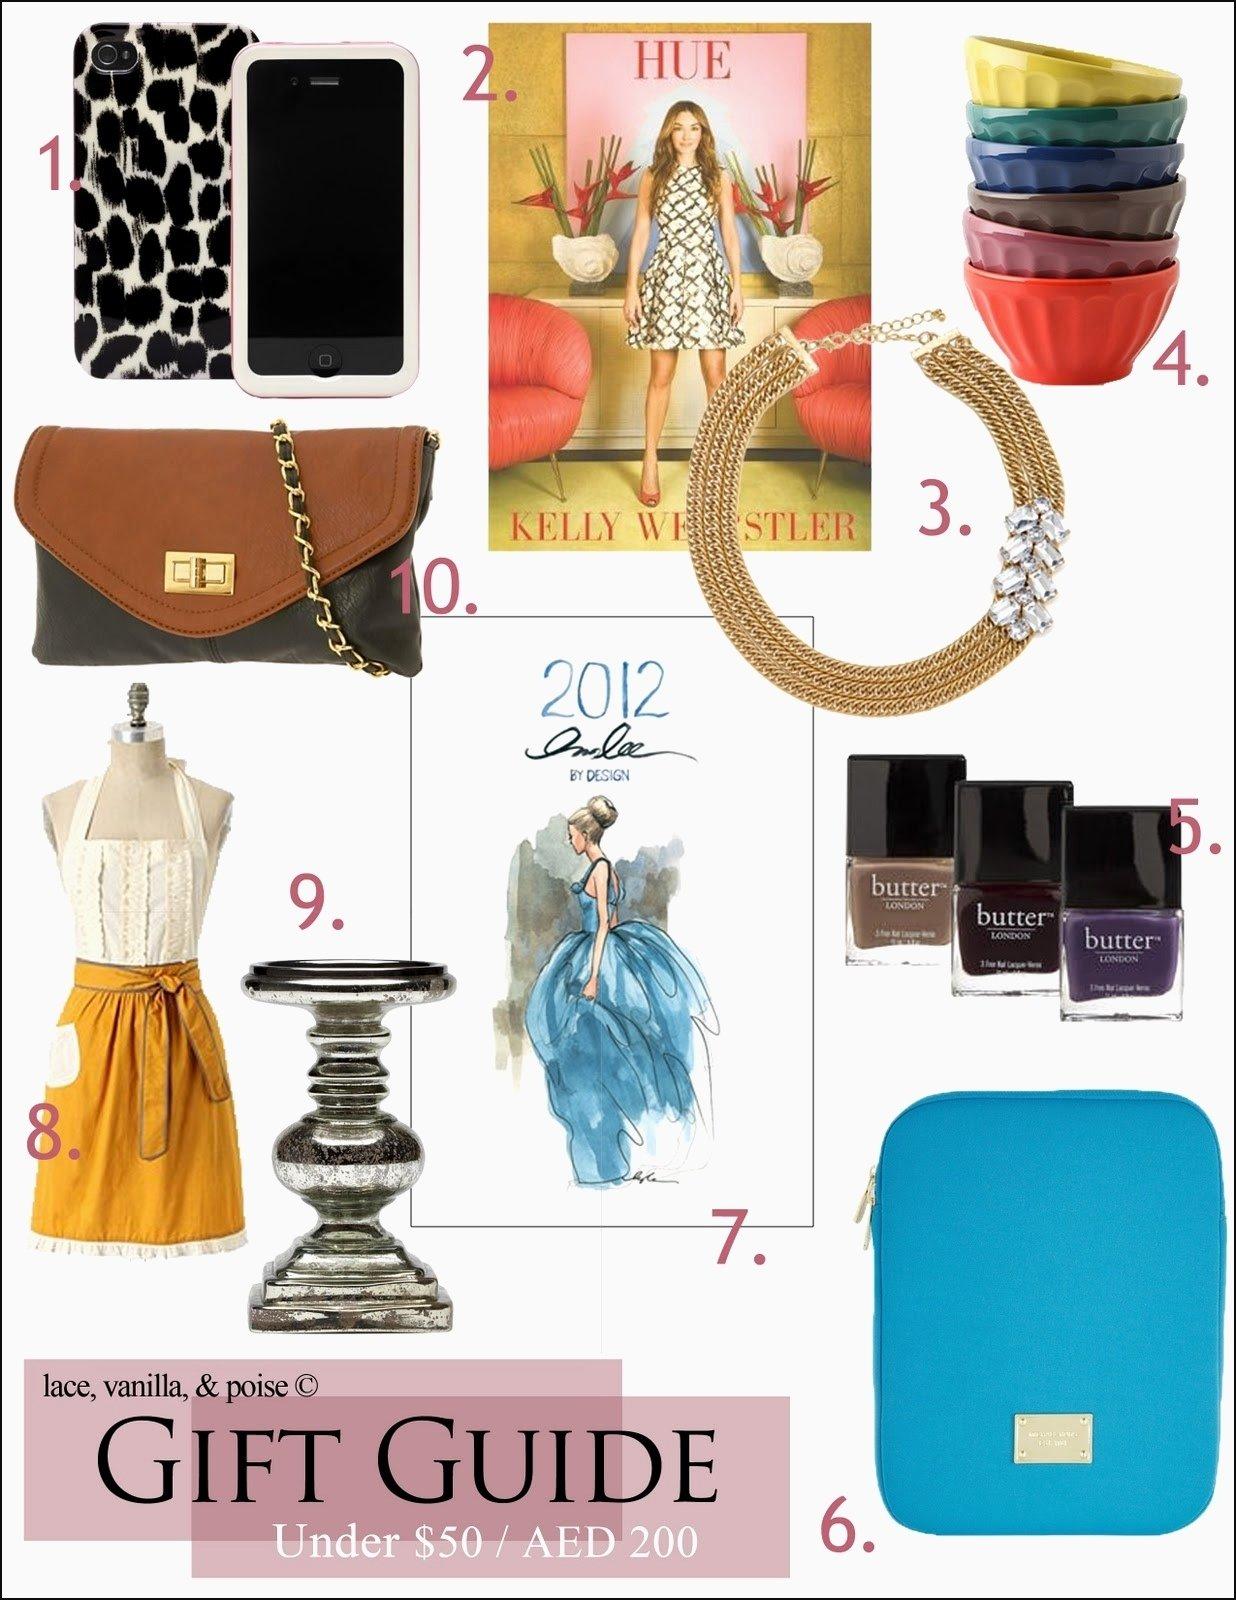 10 Gorgeous Best Christmas Gift Ideas For Men 2012